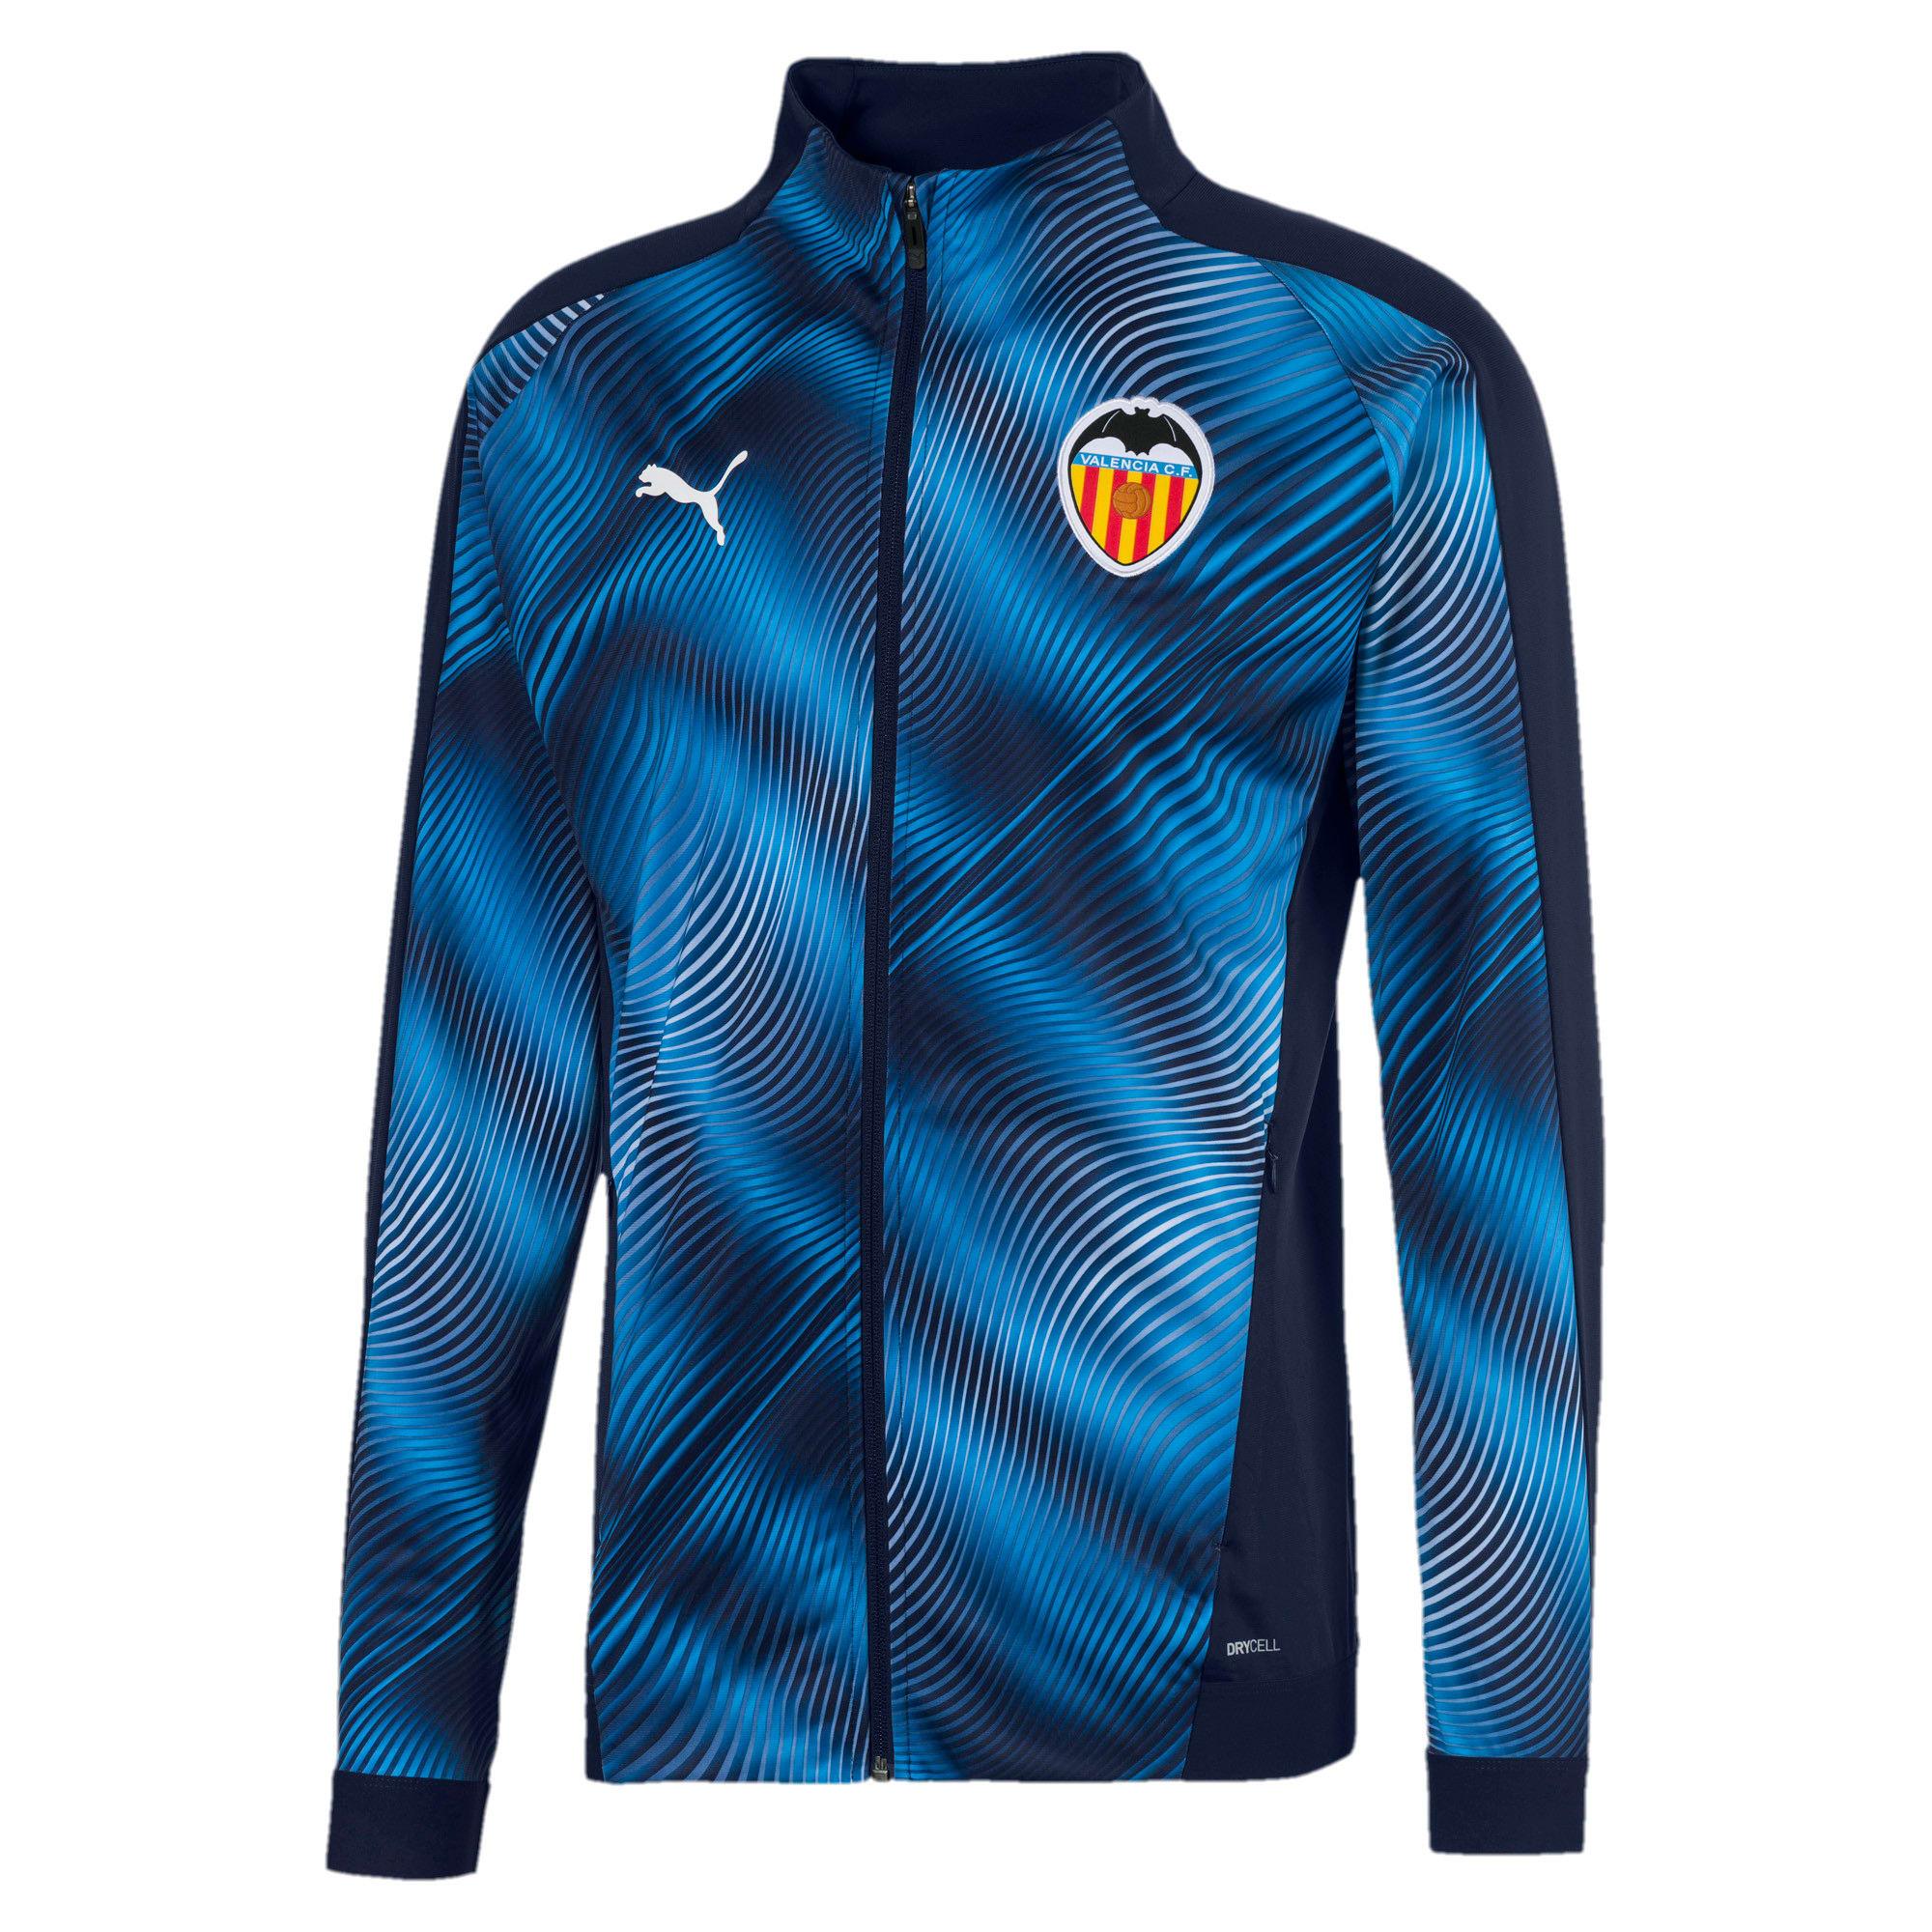 Thumbnail 1 van Valencia CF stadionjack voor mannen, Peacoat-Vibrant Orange, medium